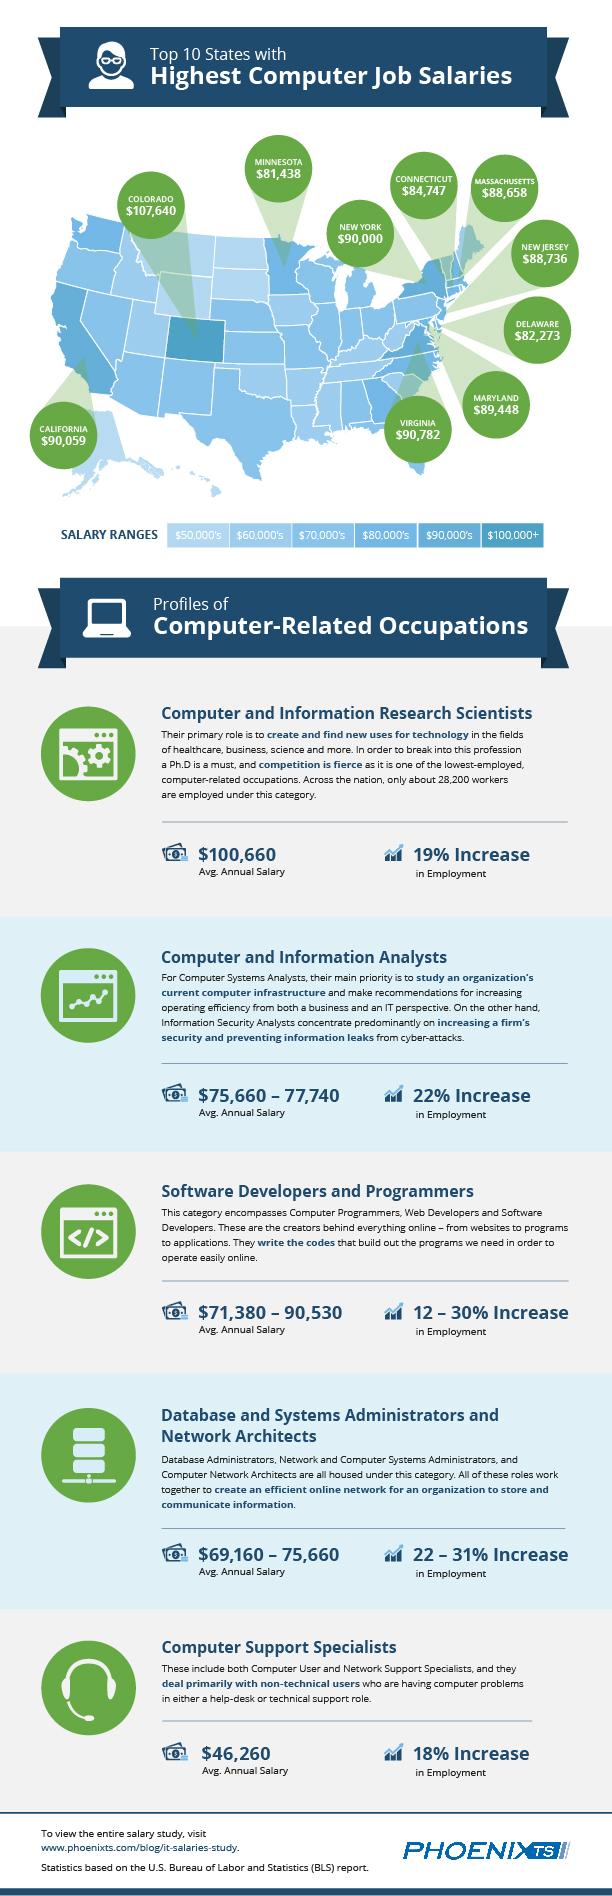 Computer Salary Job Statistics